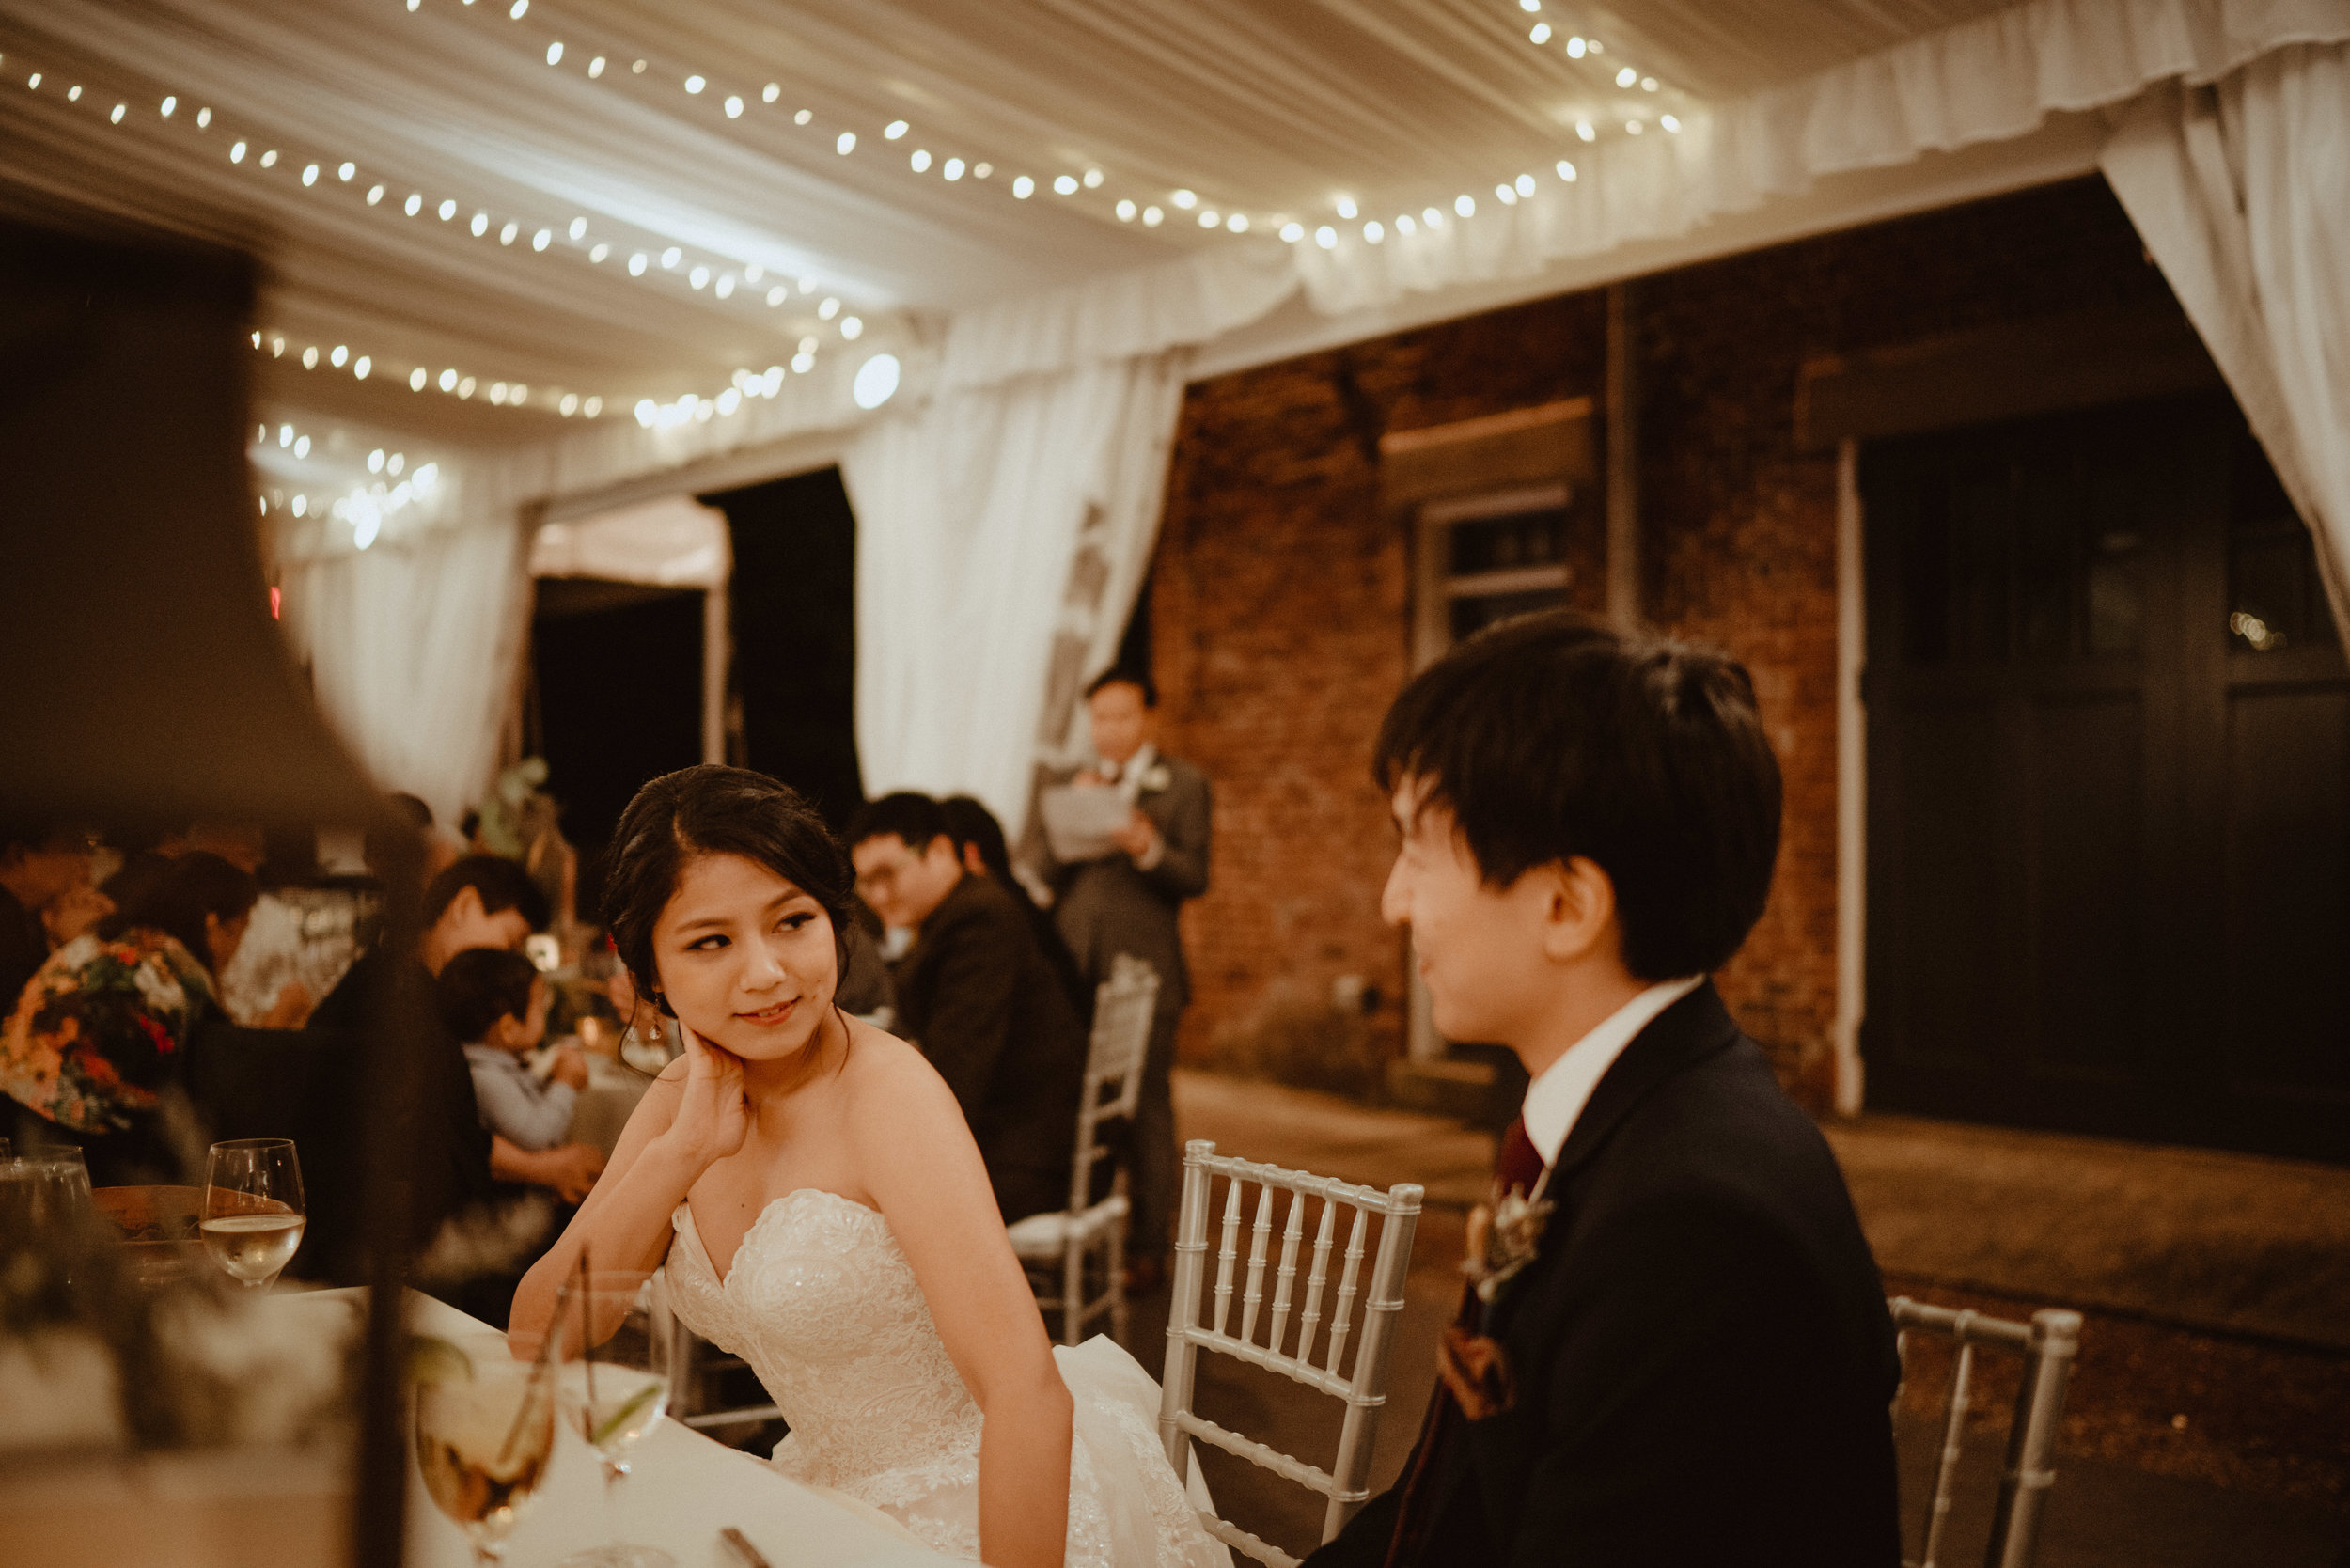 Irene-and-Jae-2019_Brooklyn_Wedding_Photographer_Chellise_Michael_Photography--120.jpg